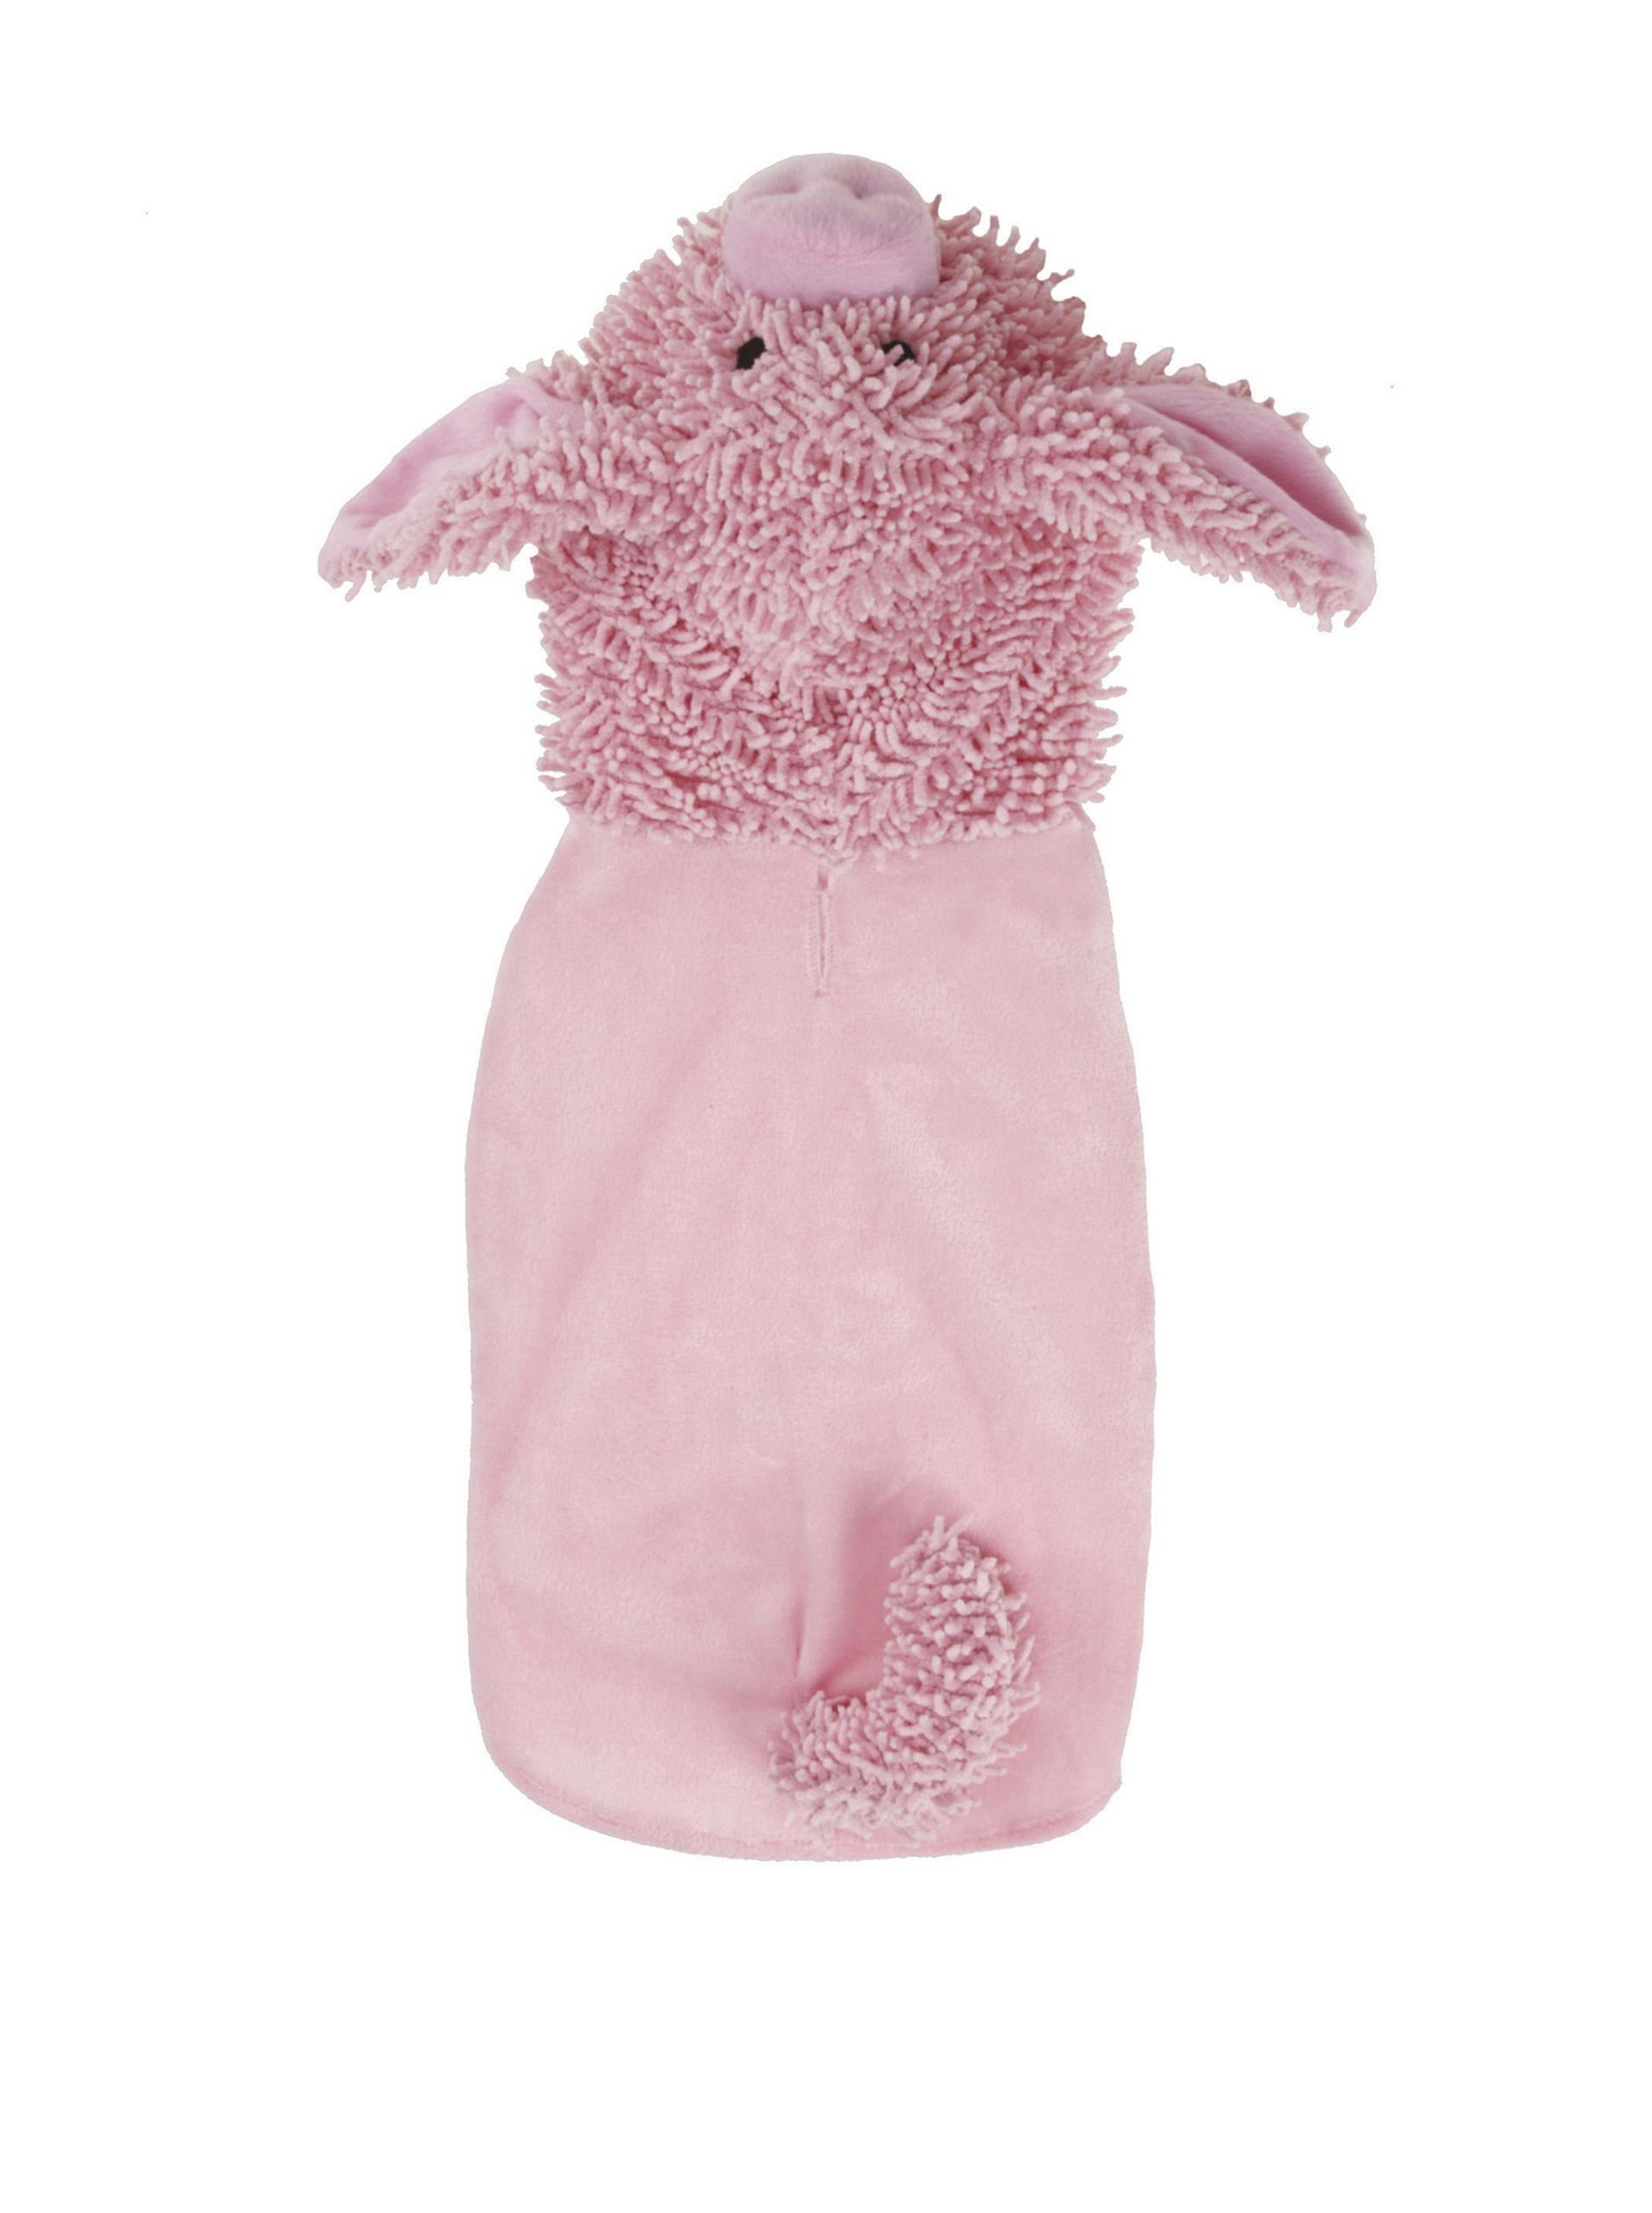 Porky Pup Dog Costume Size: Large (20'' H x 13'' W x 0.25'' D)